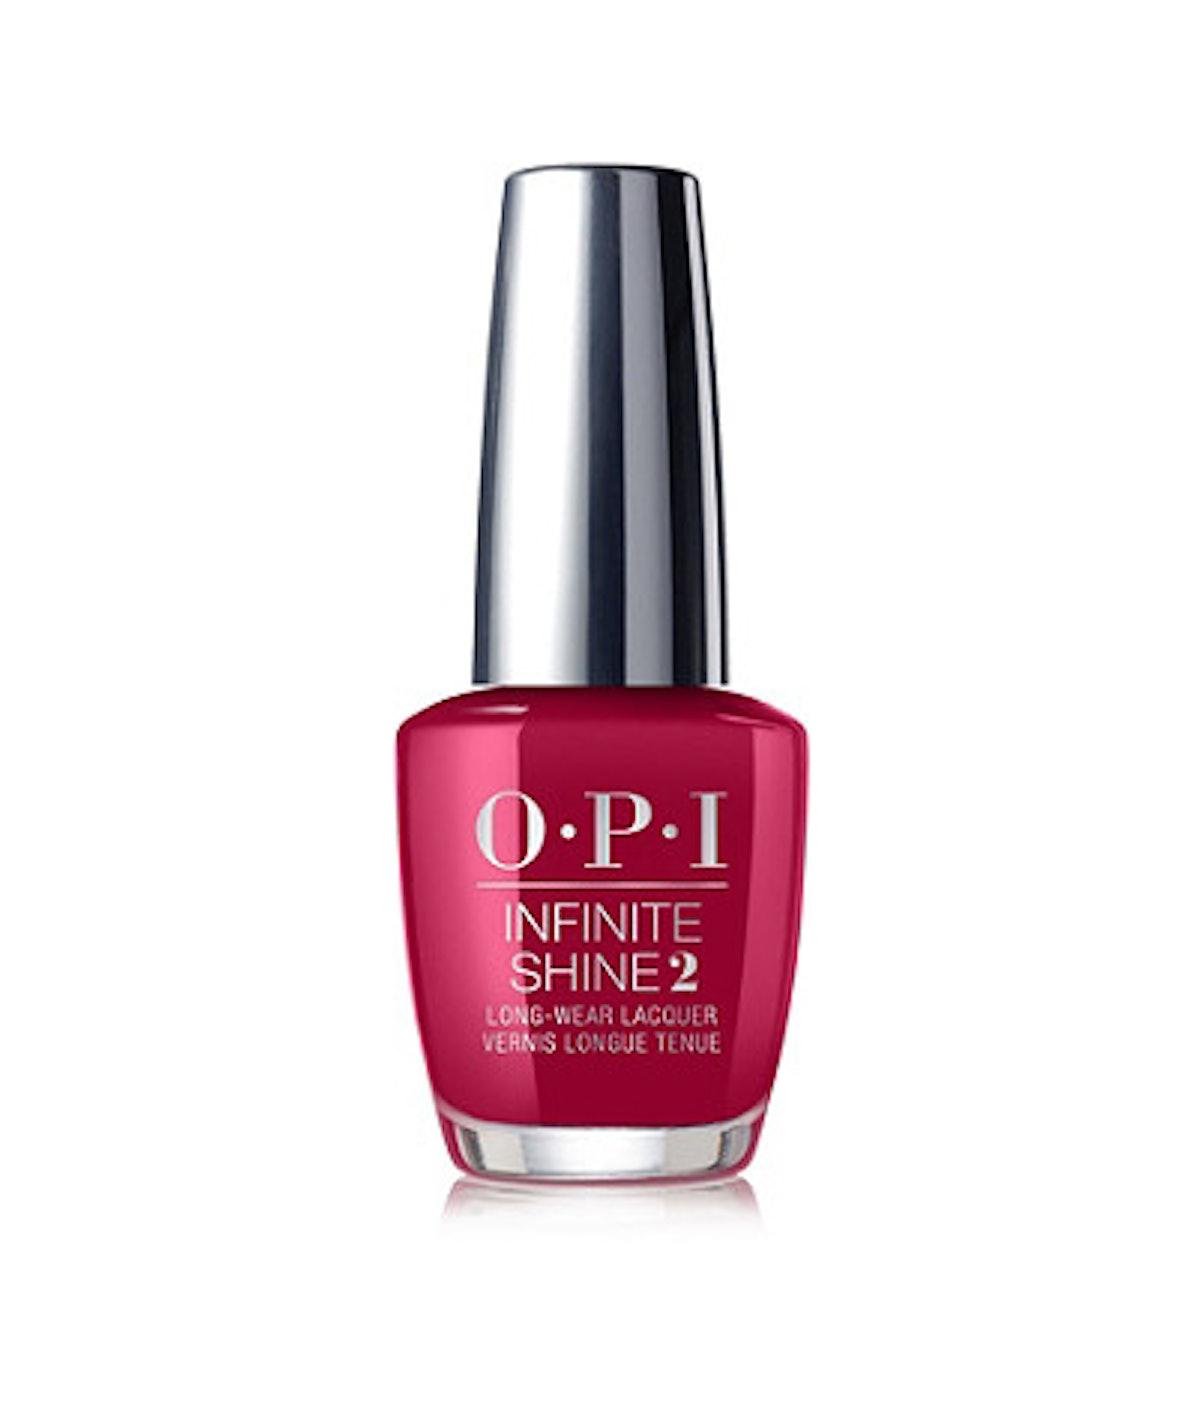 OPI Iconic Infinite Shine in OPI Red